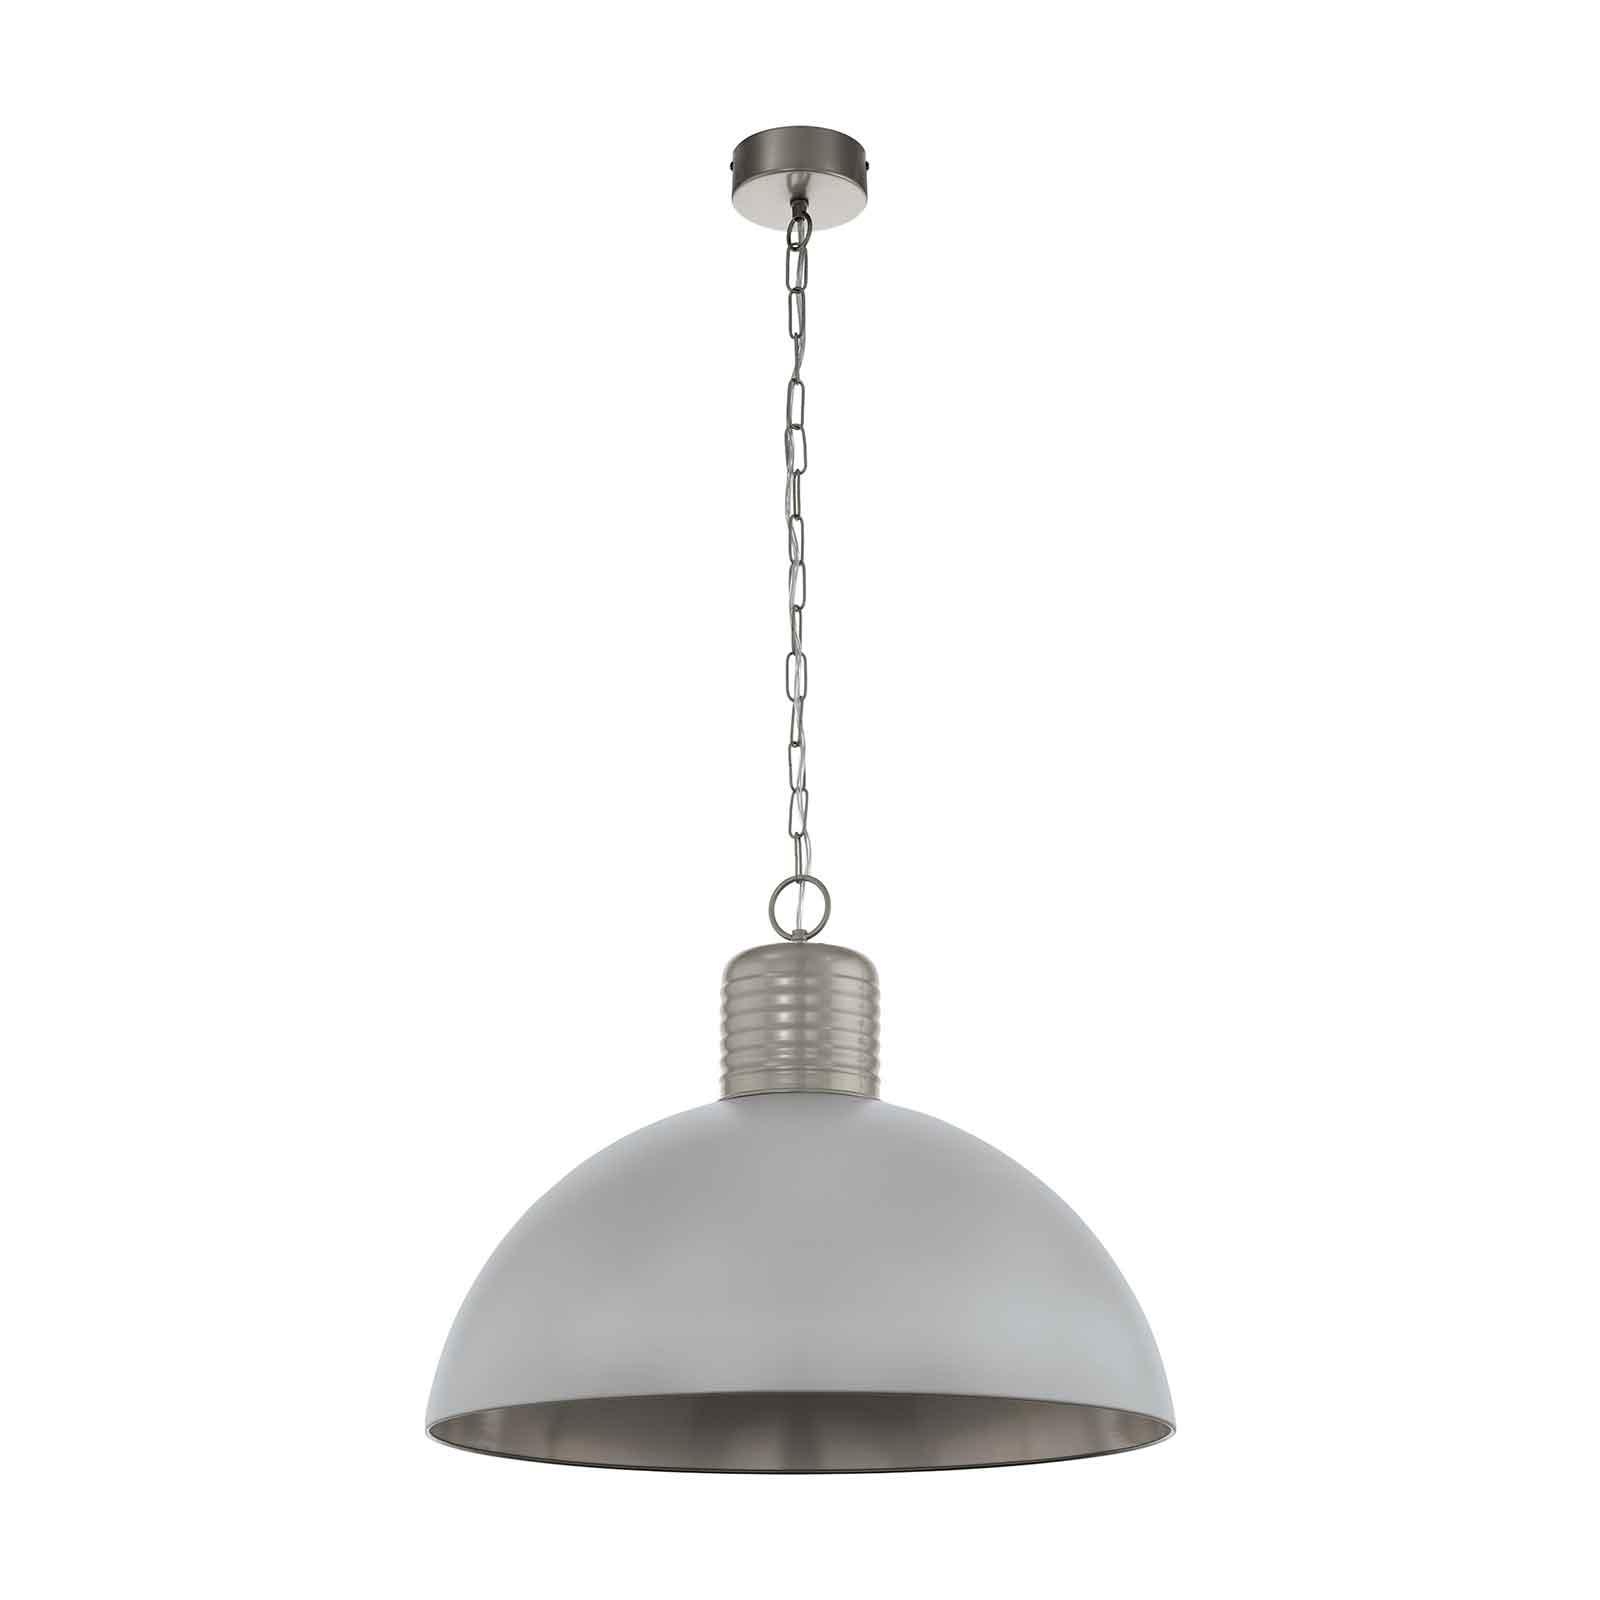 Lampa wisząca Coldridge, aluminium, 65 cm, szary